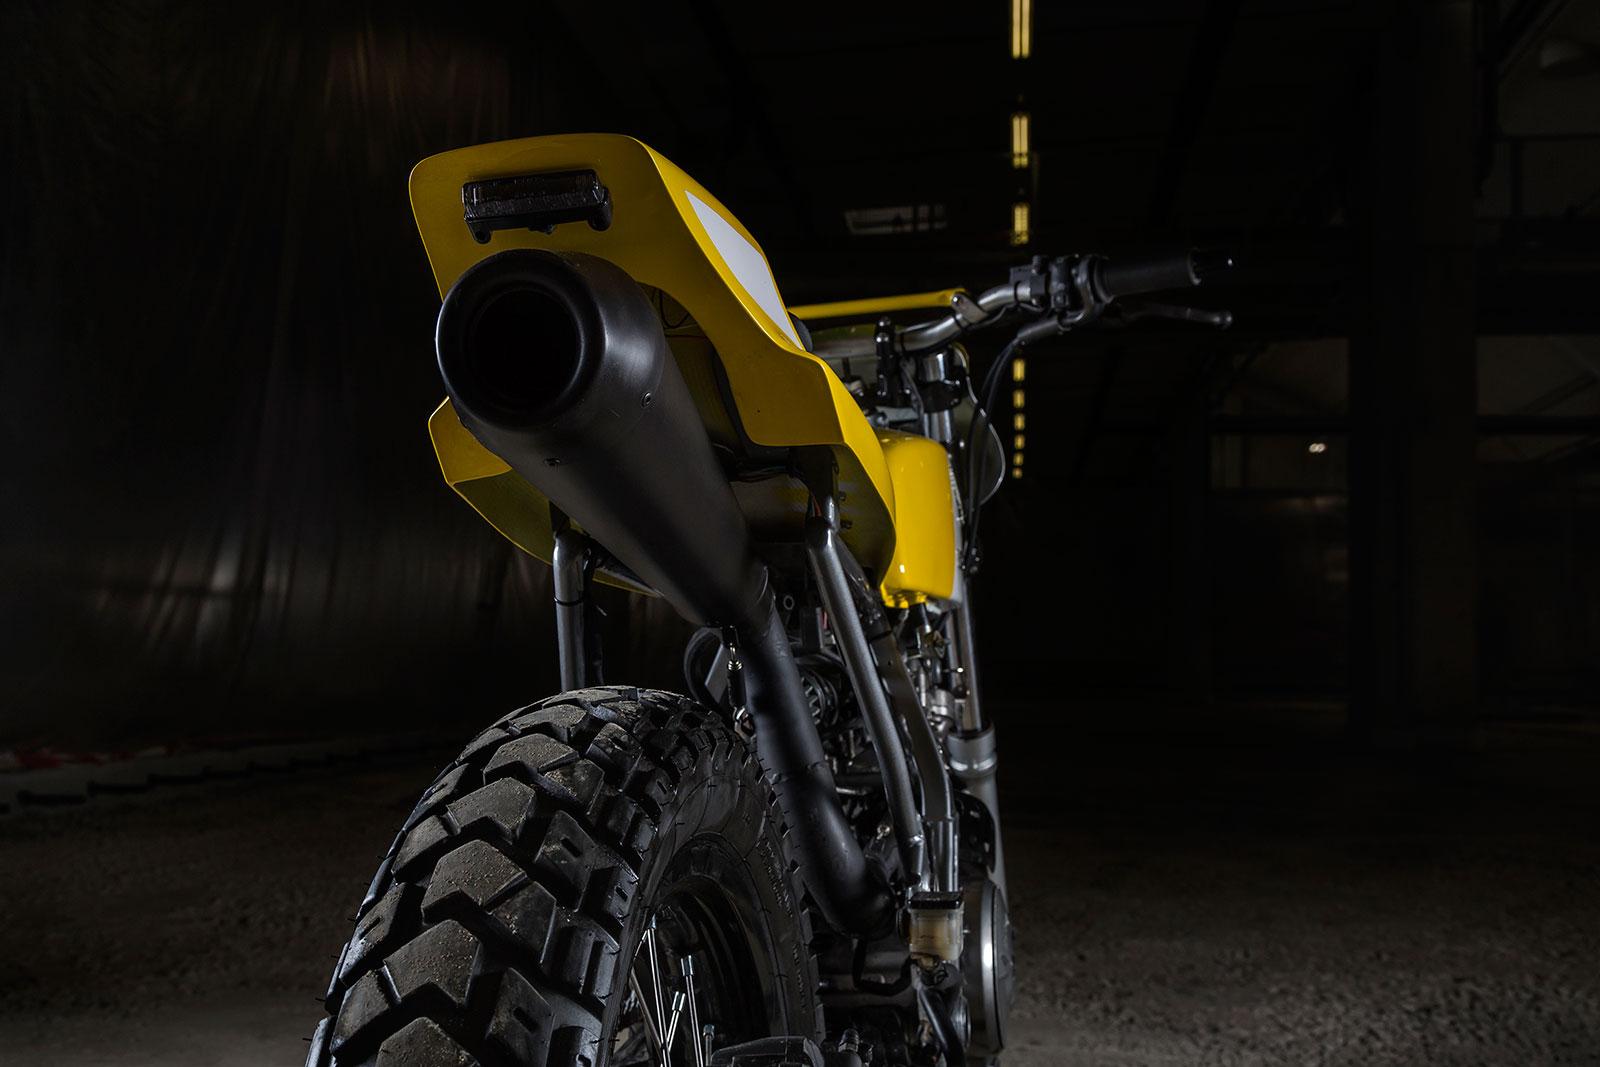 honda-nx650-dominator-by-titan-motorcycles-03